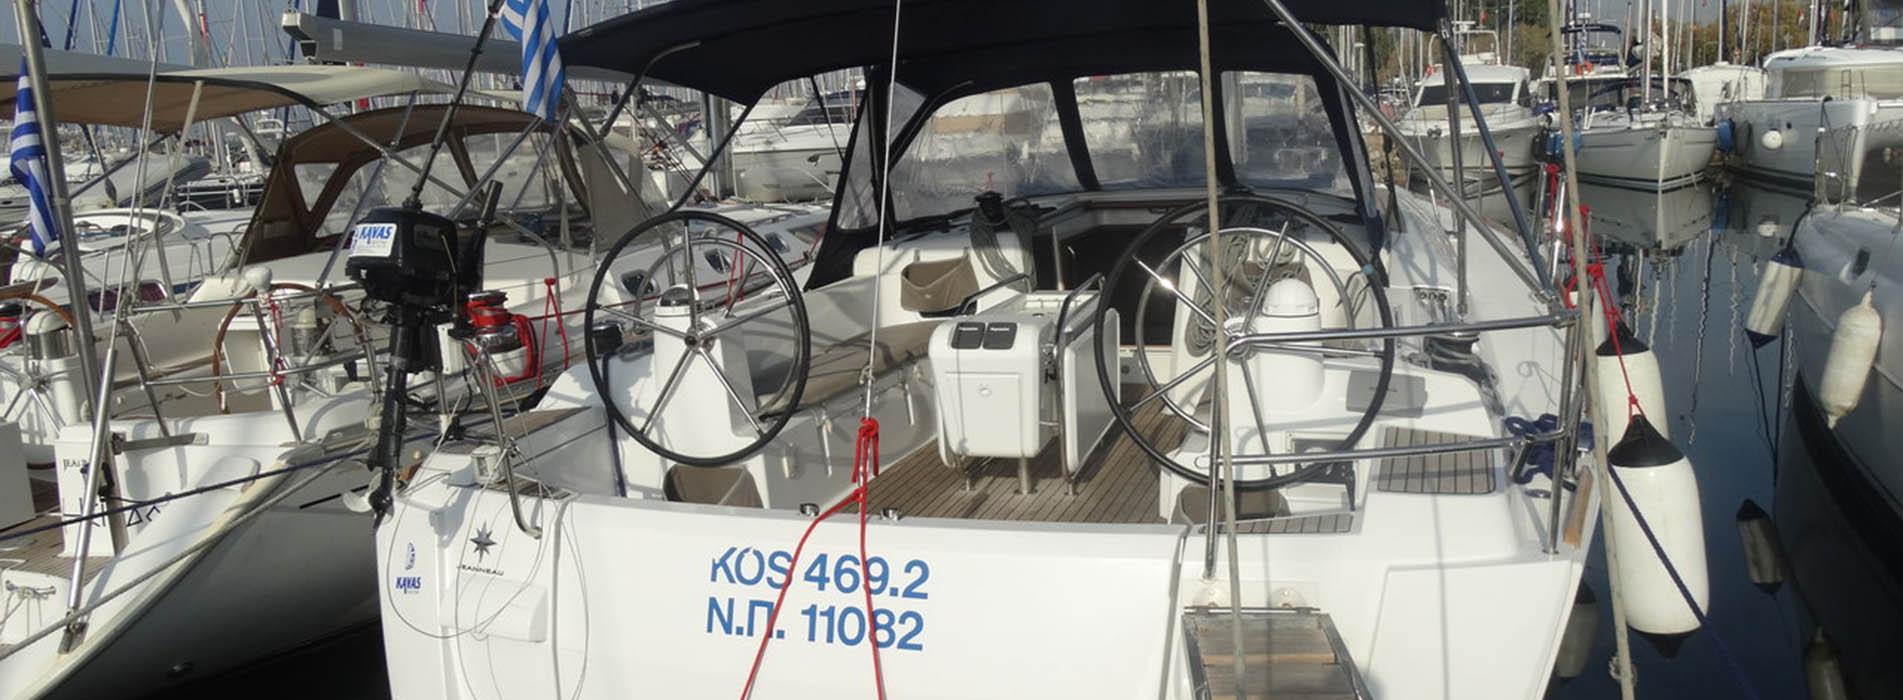 Jeanneau Sun Odyssey 469 - Kos 469.2 1 (main)